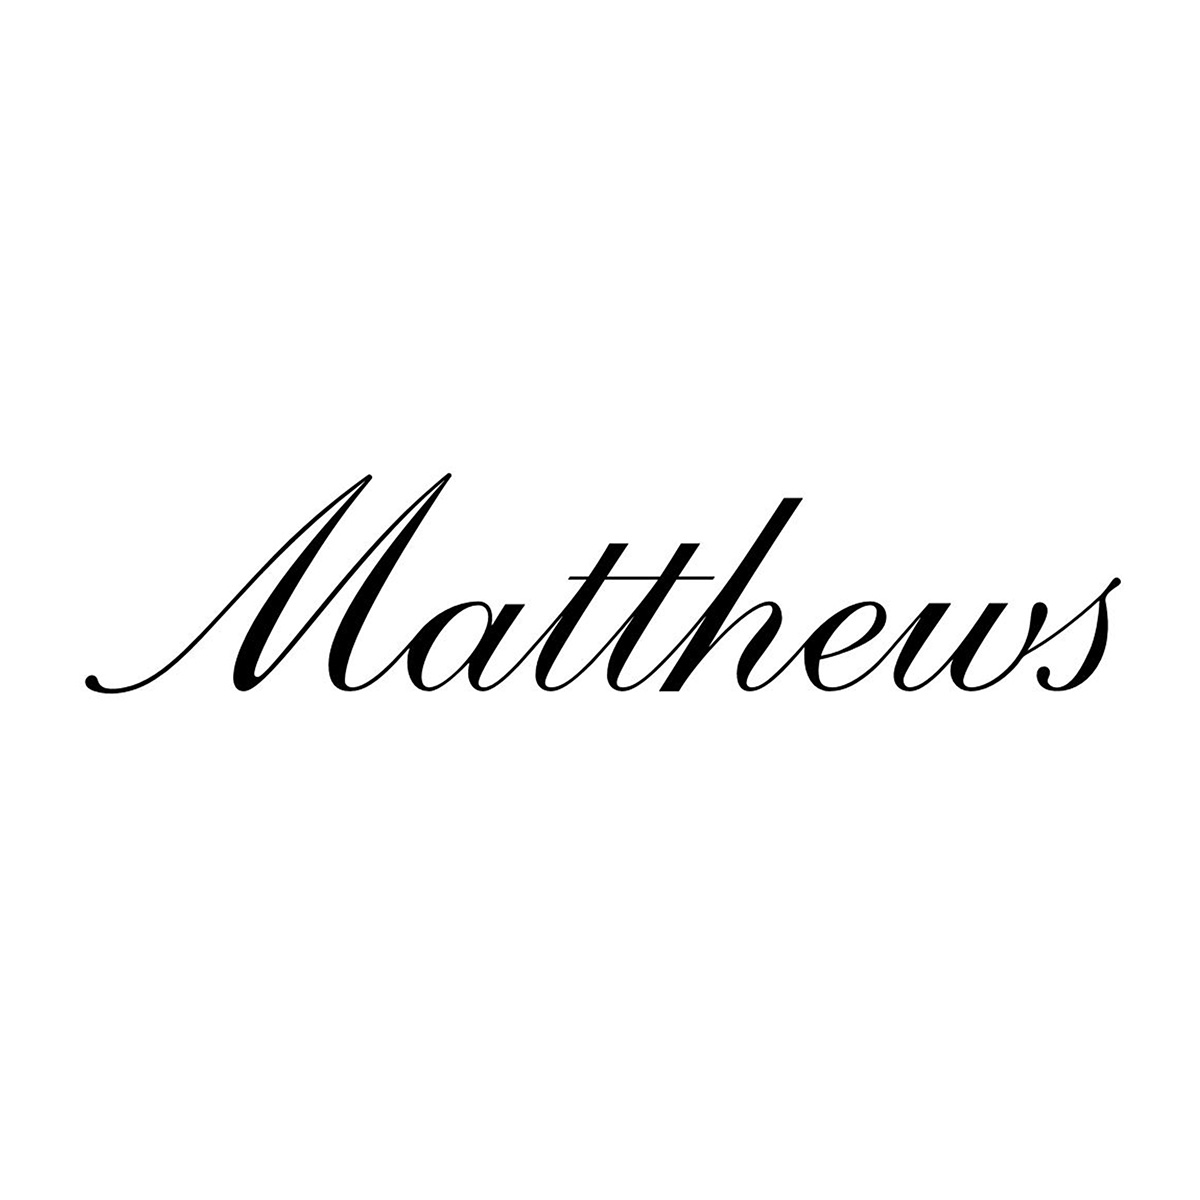 Matthews square.jpg